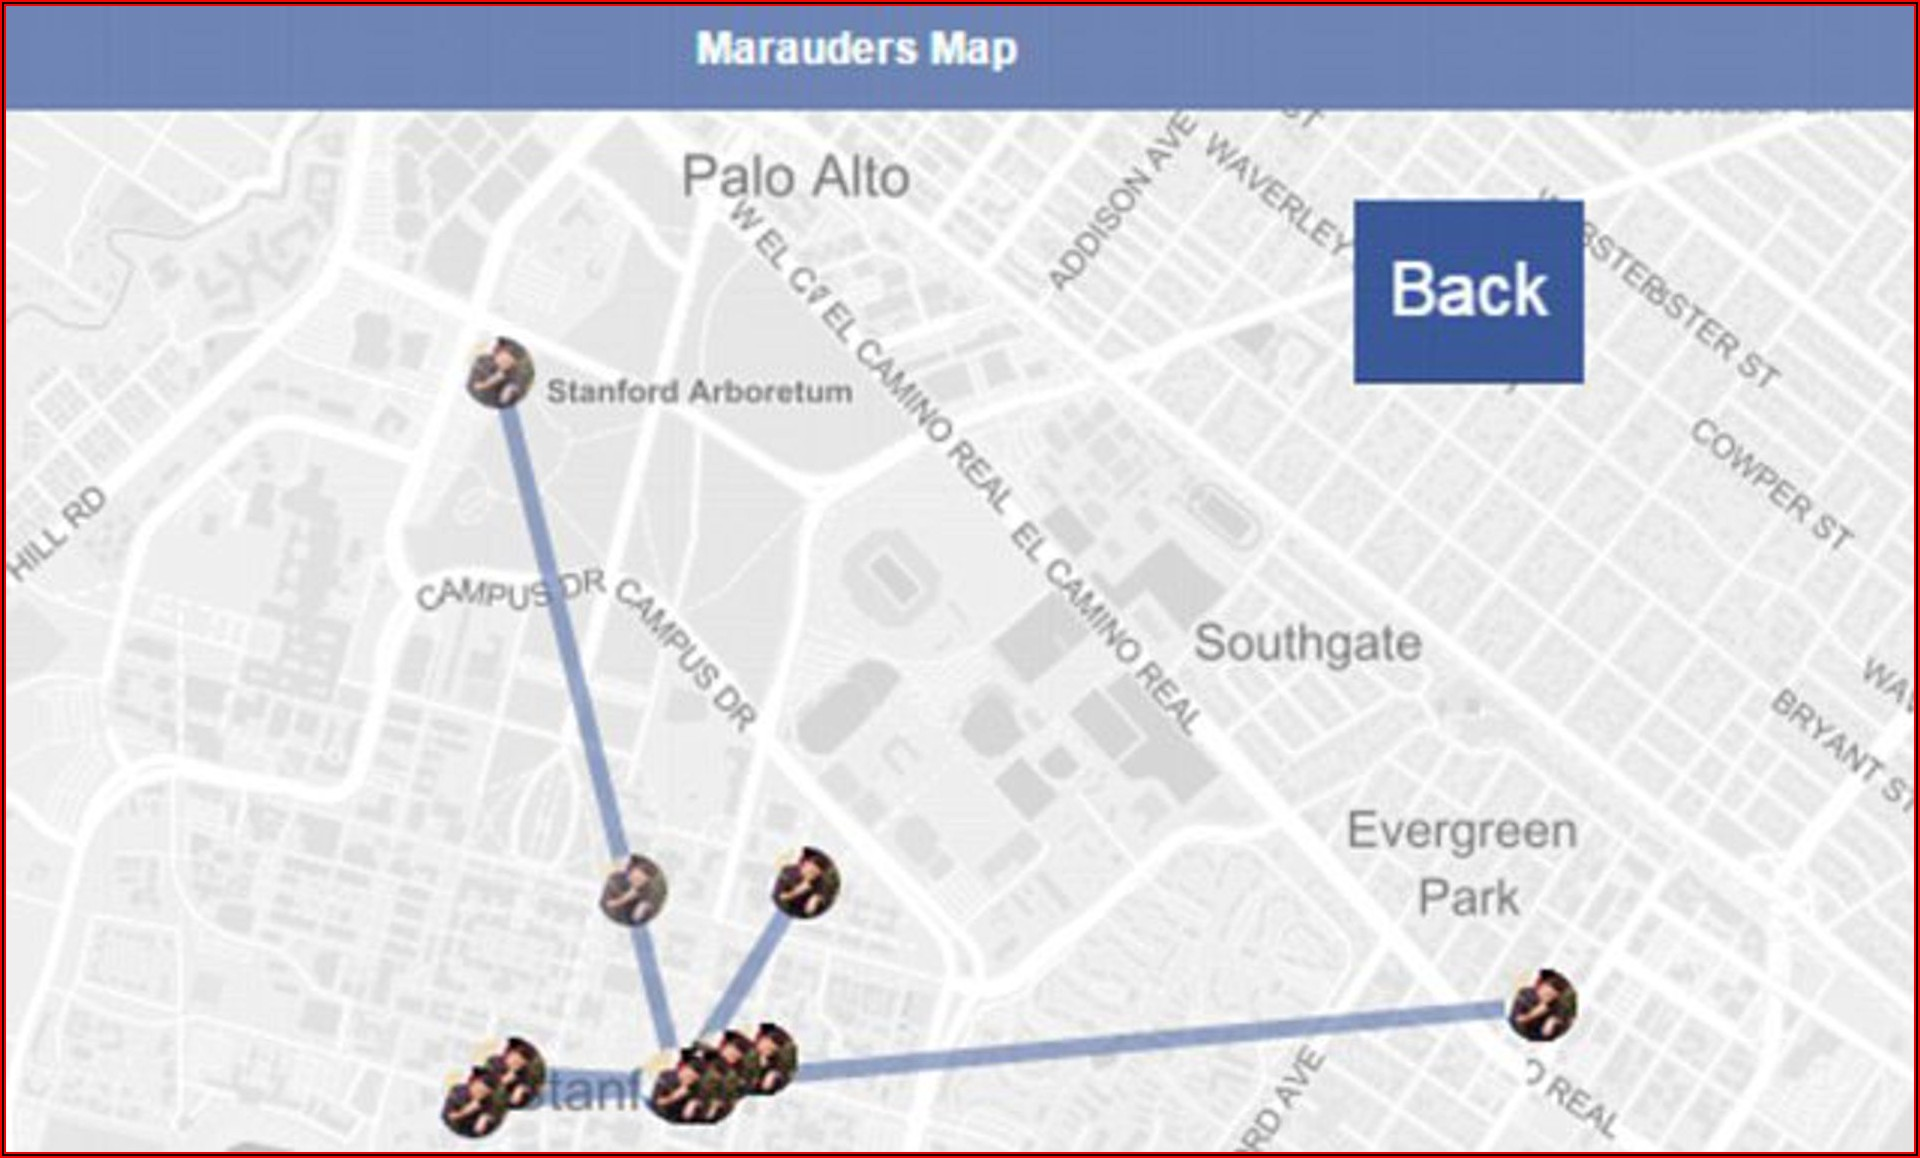 Marauders Map Online Facebook